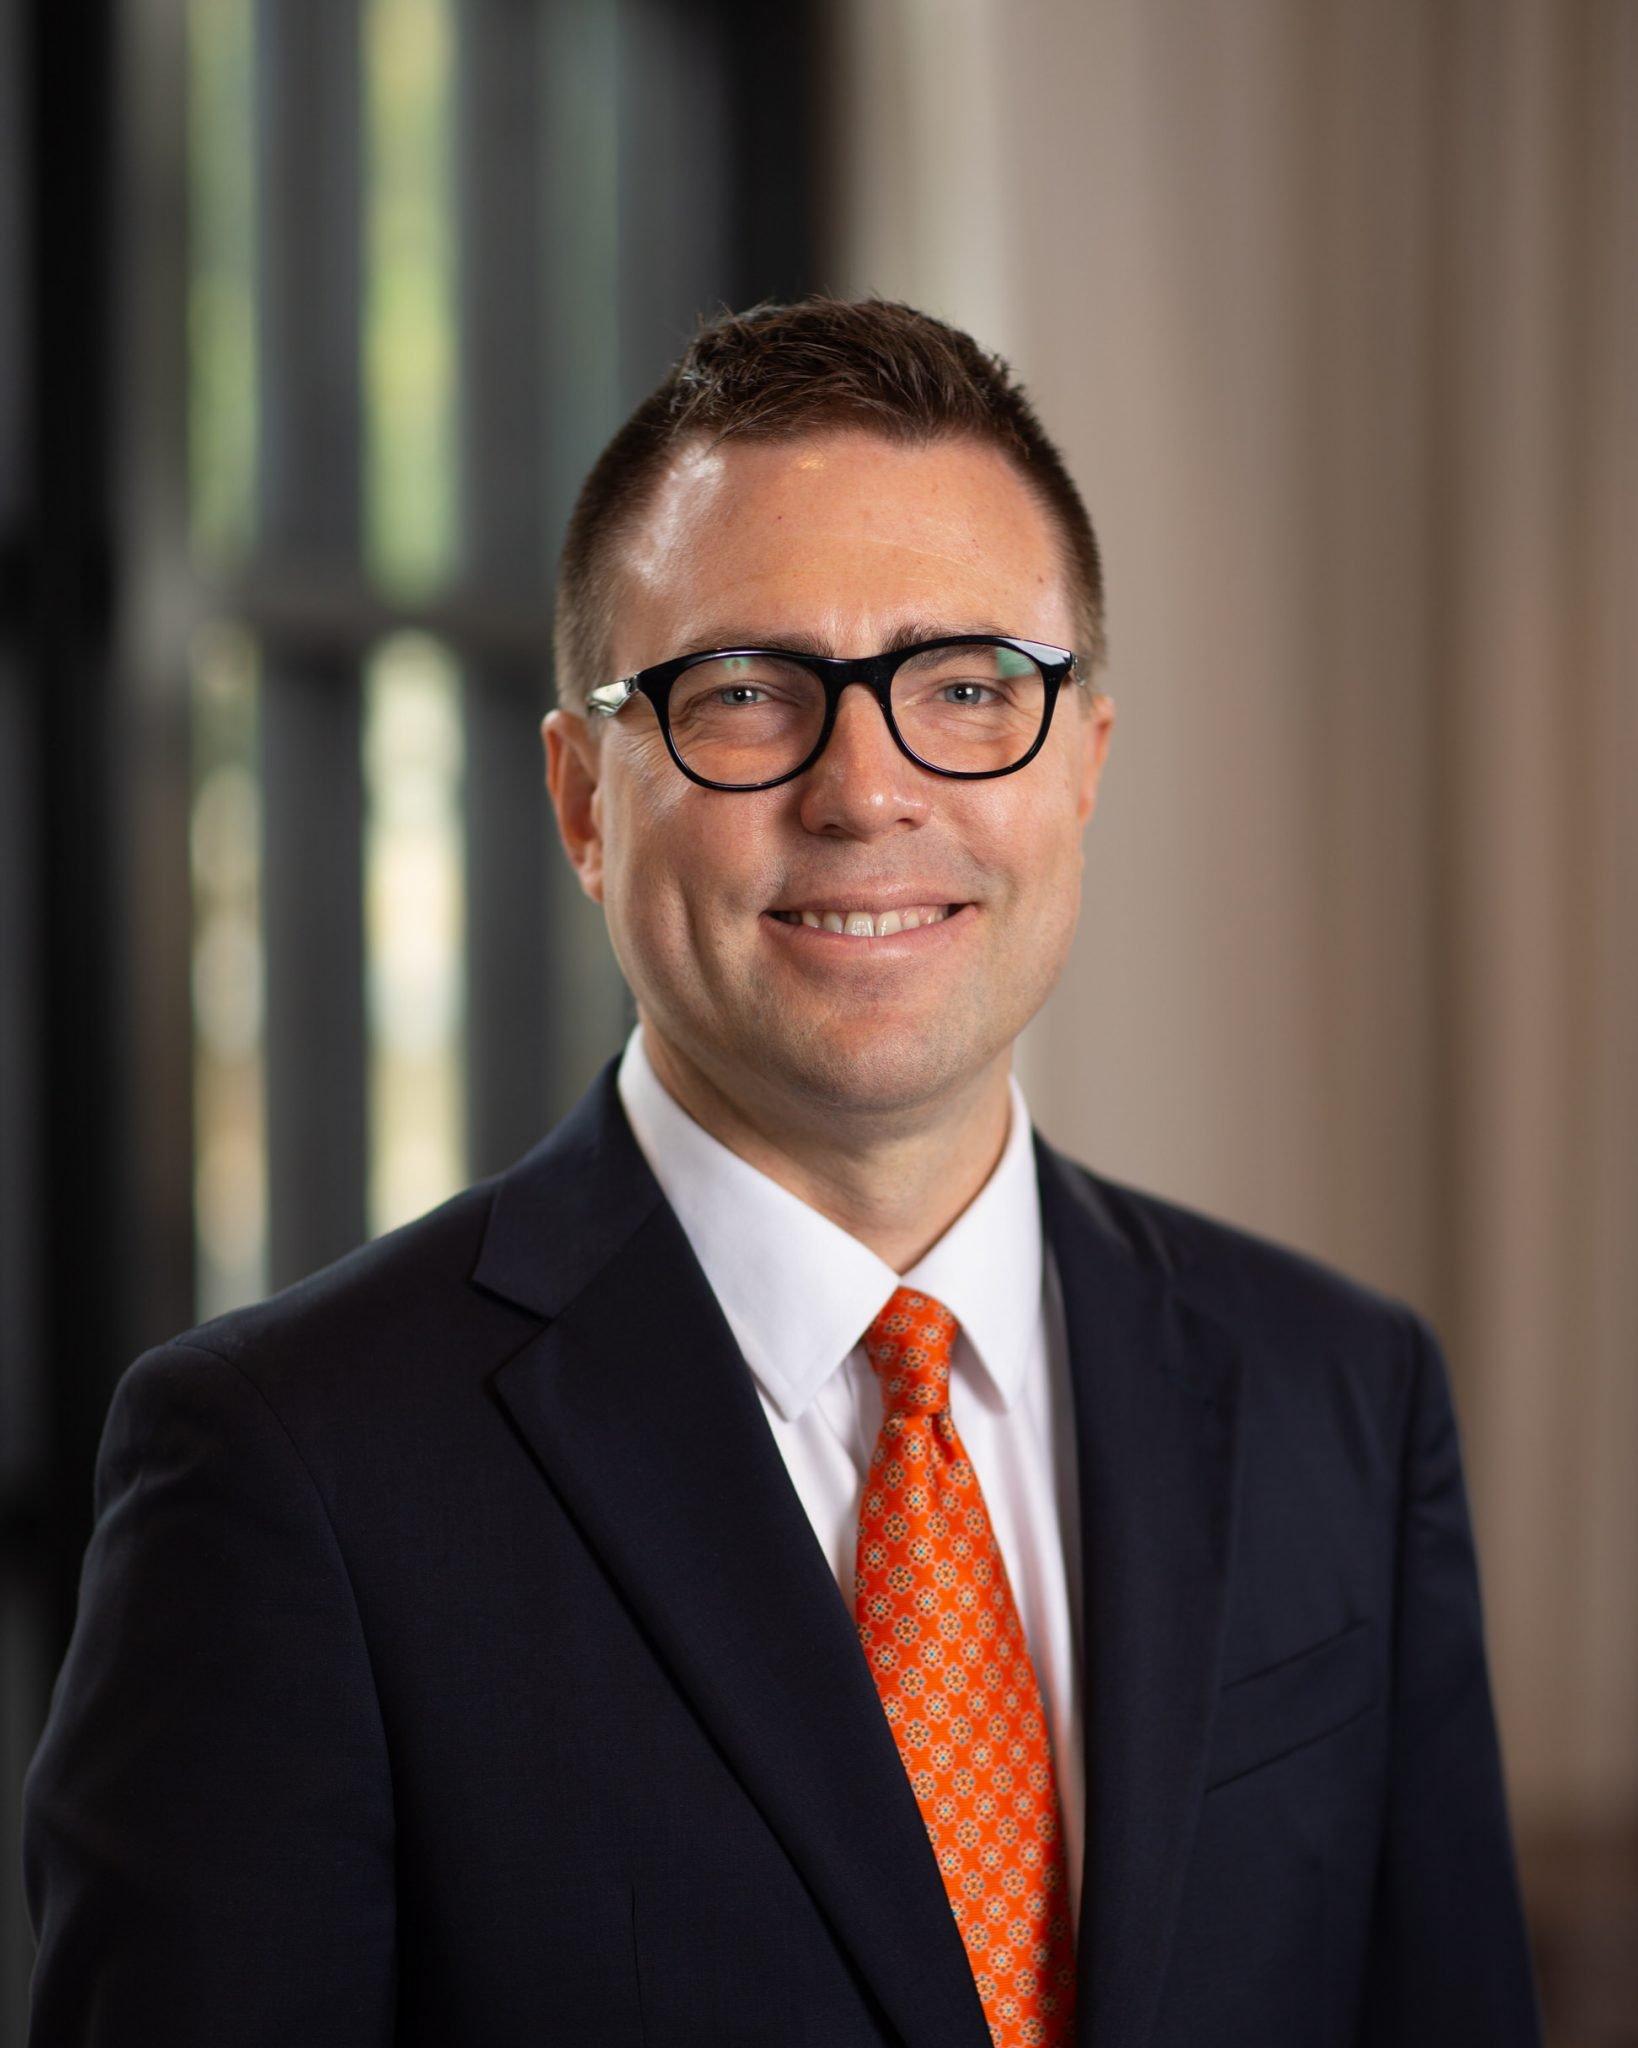 Dave Mattern, Partner and Beverage Director since 2004